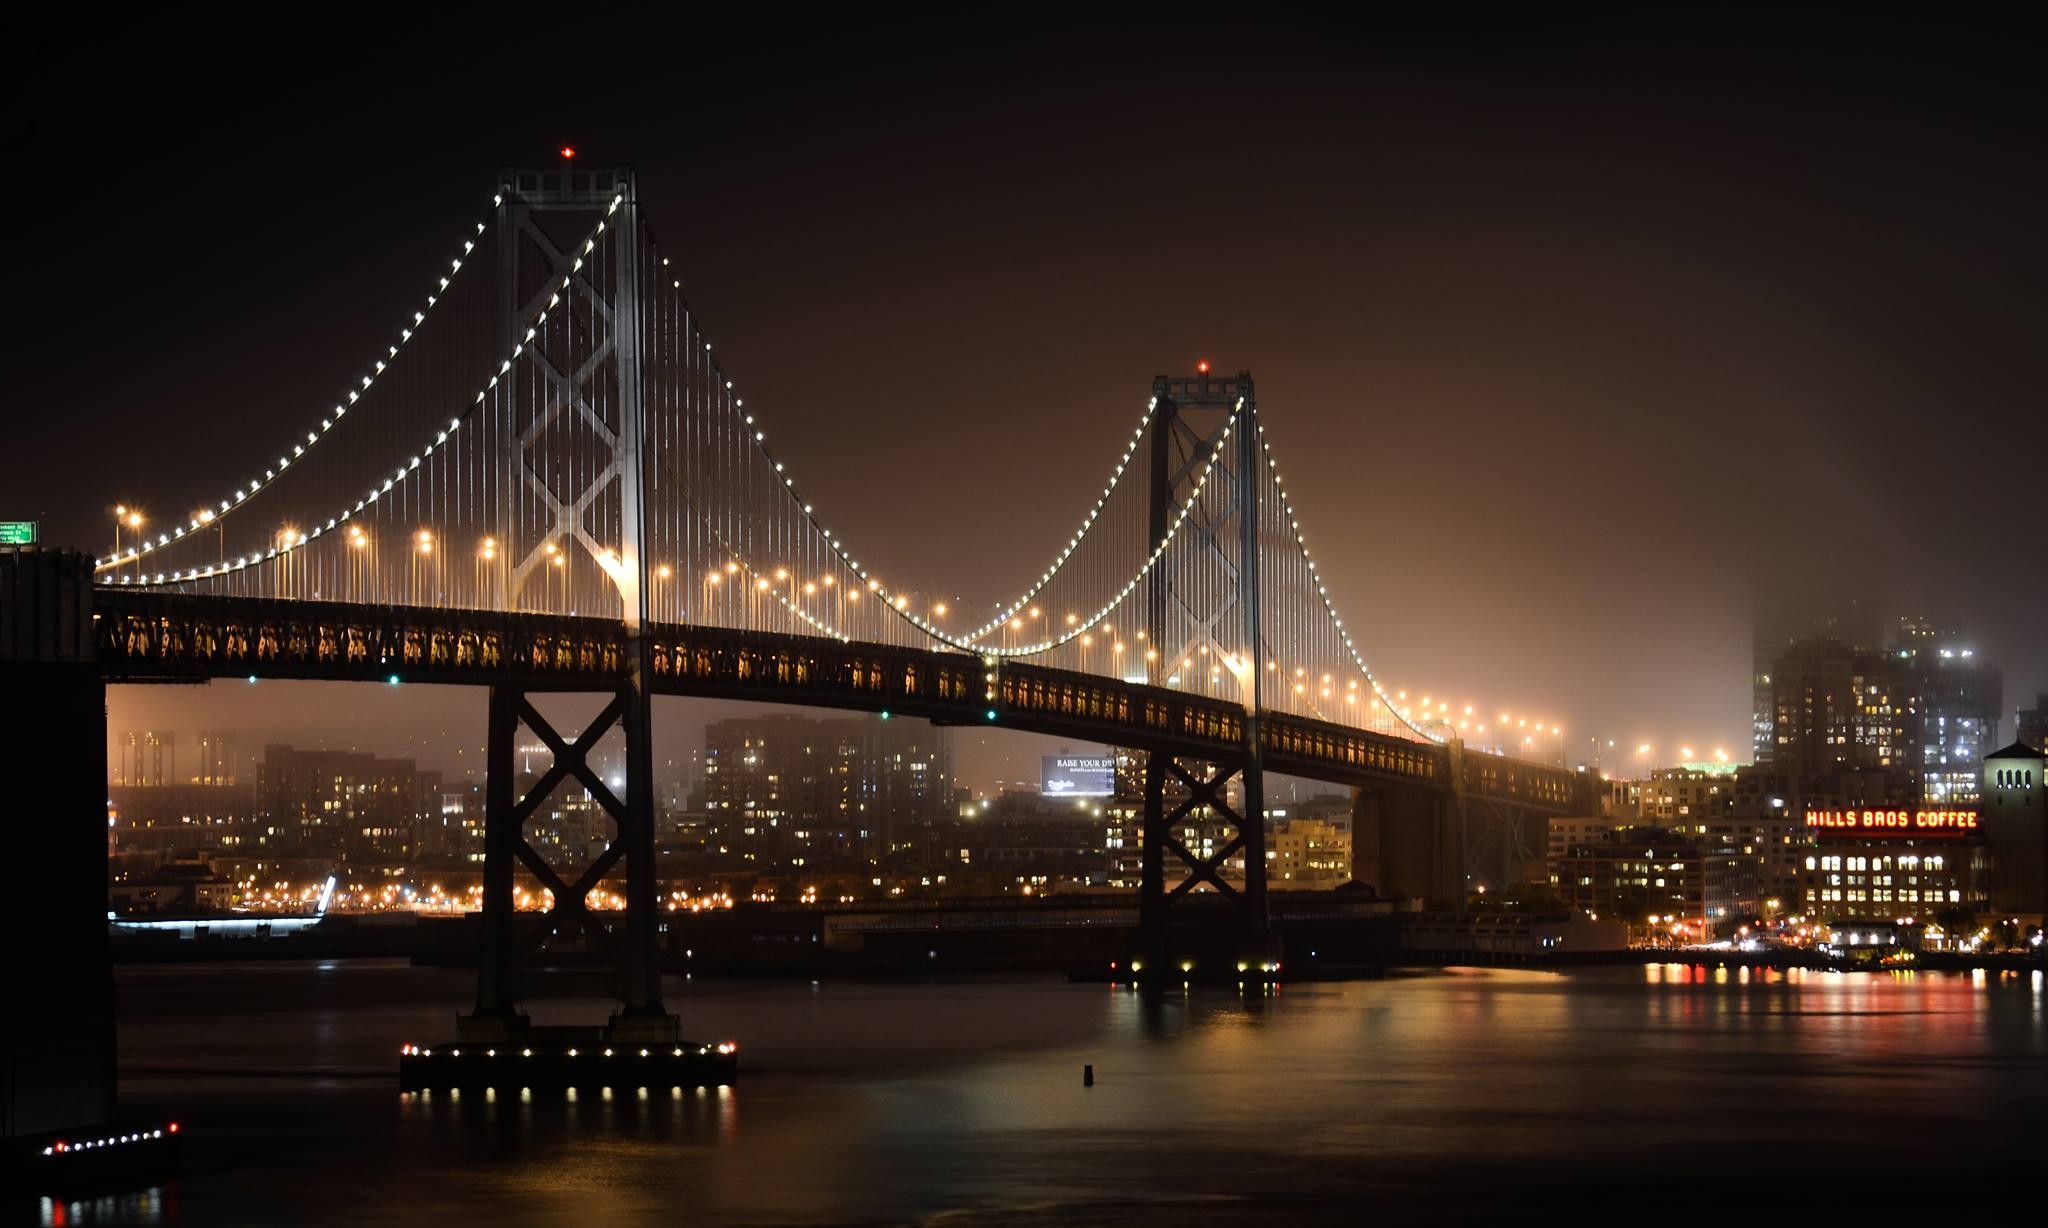 Bay Bridge photo from 3 years ago